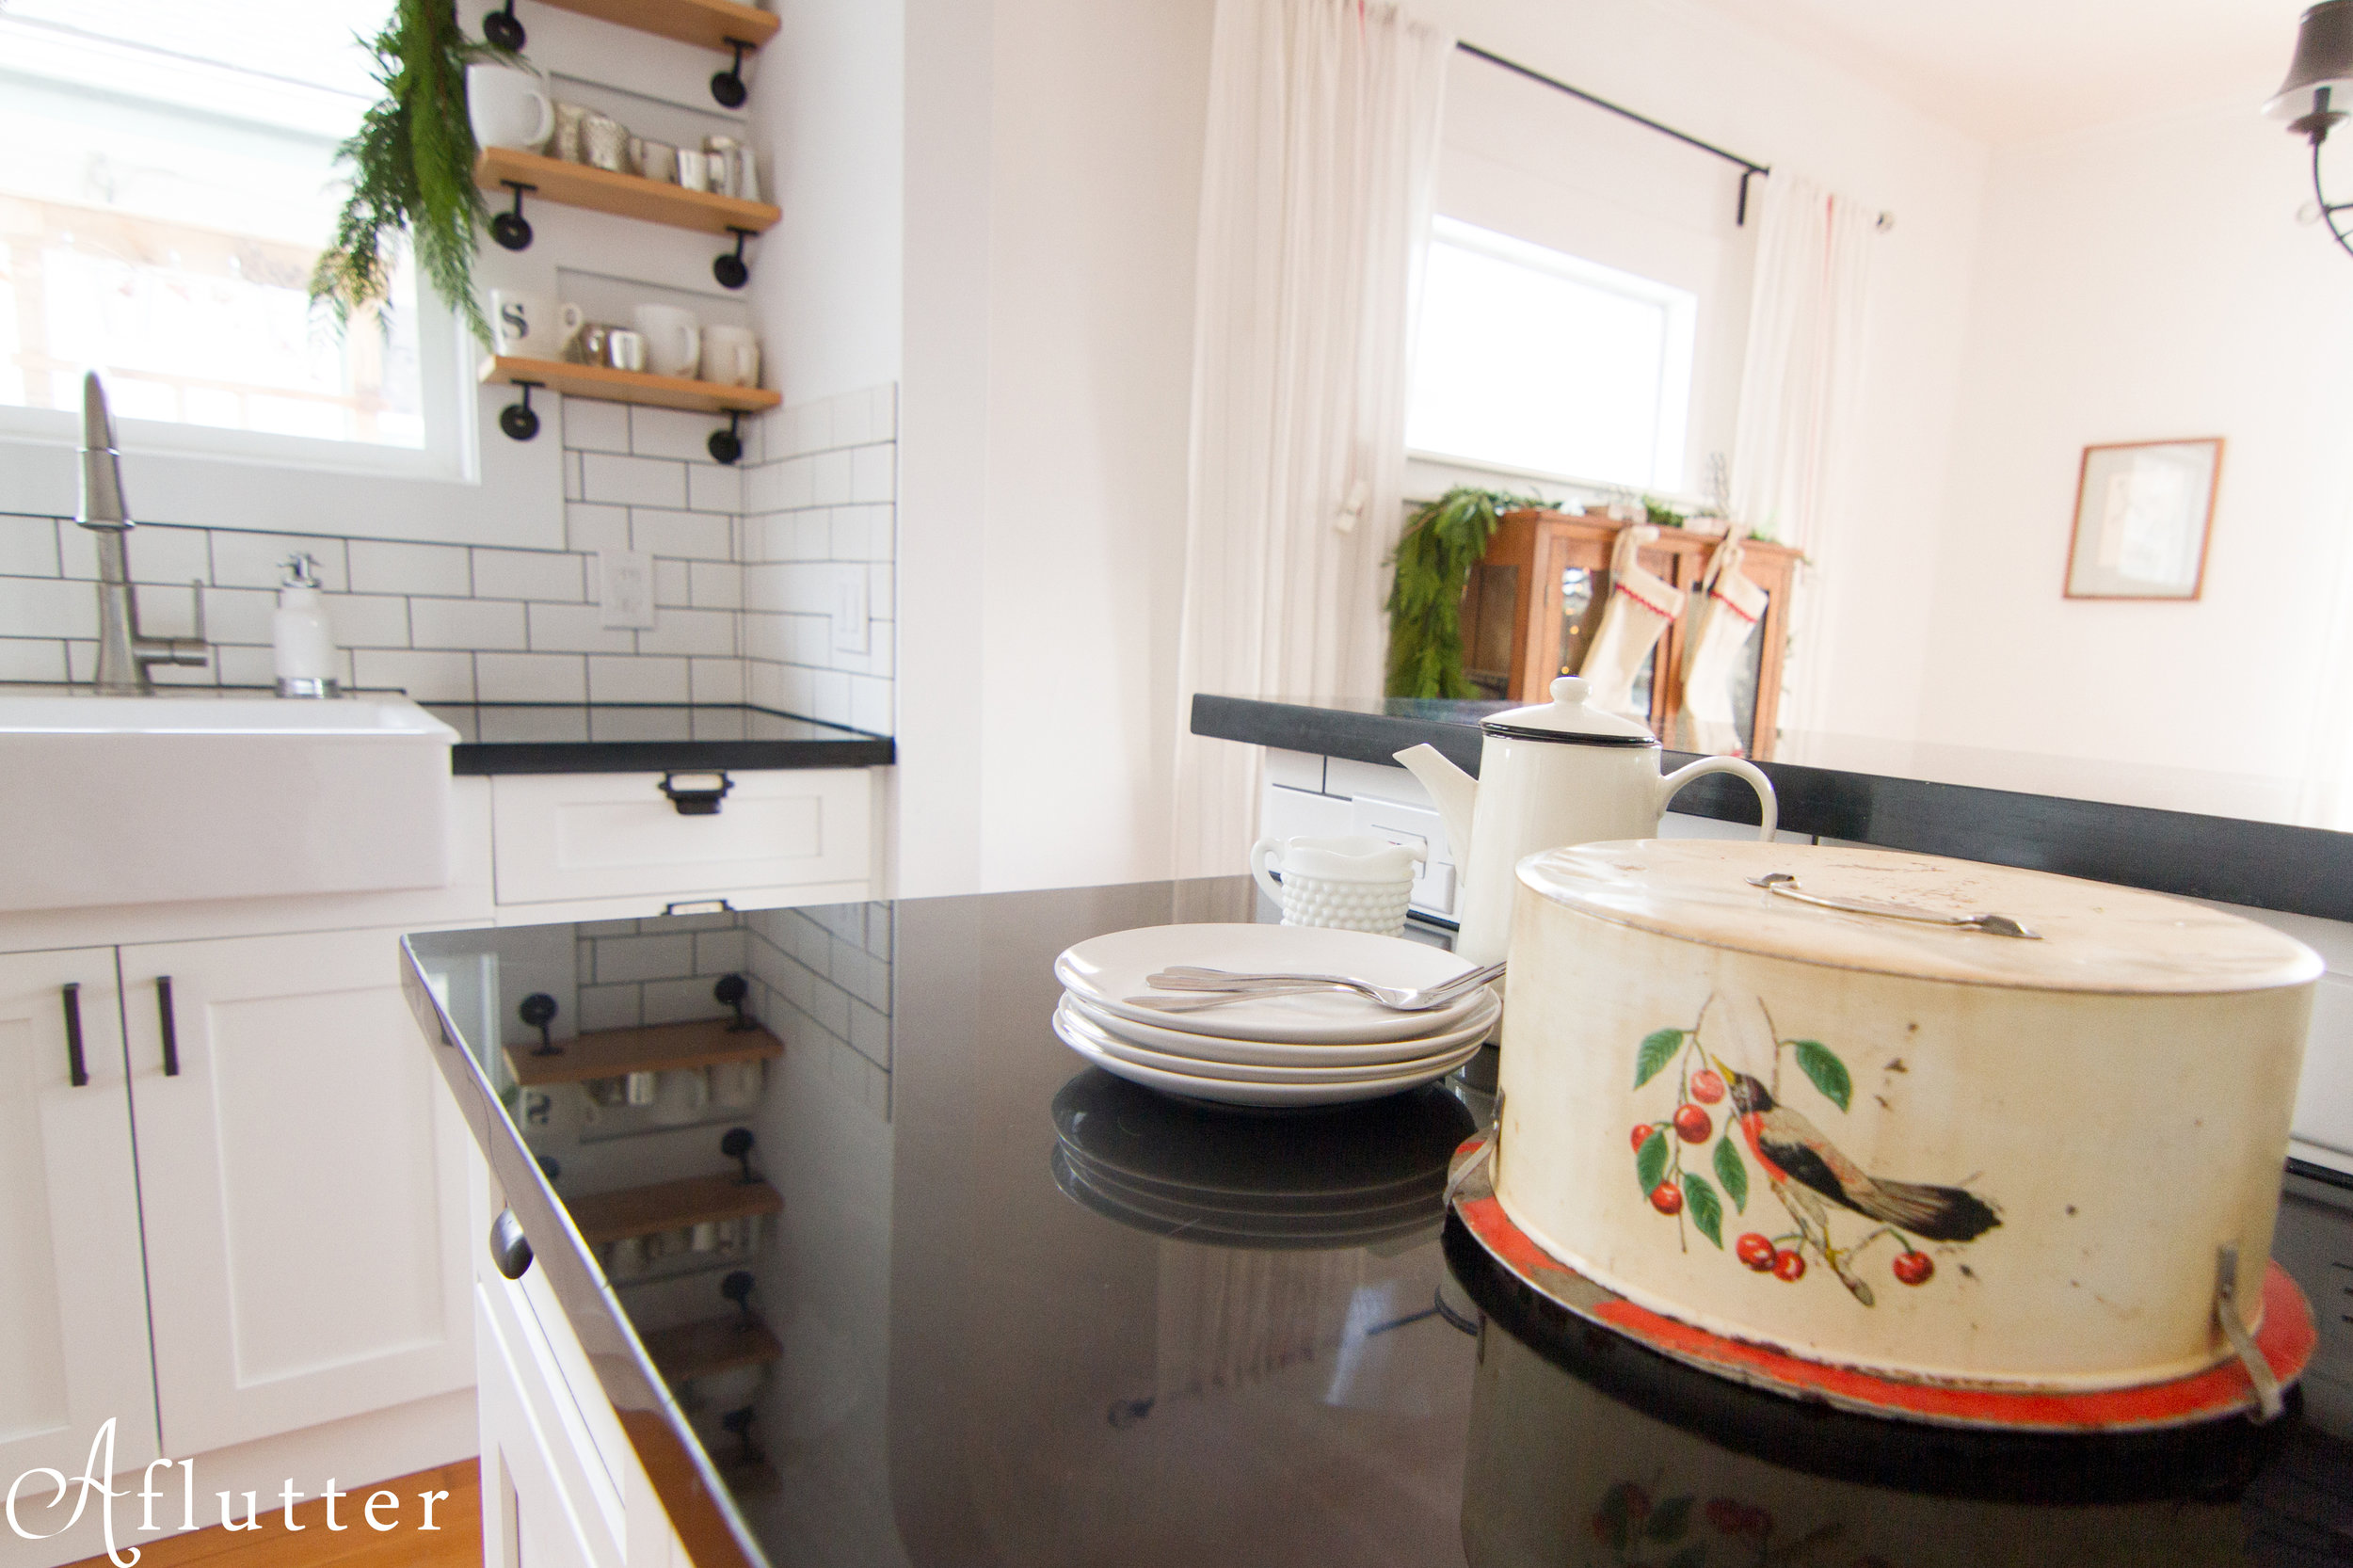 Christmas-Kitchen-Reveal-13-of-20.jpg